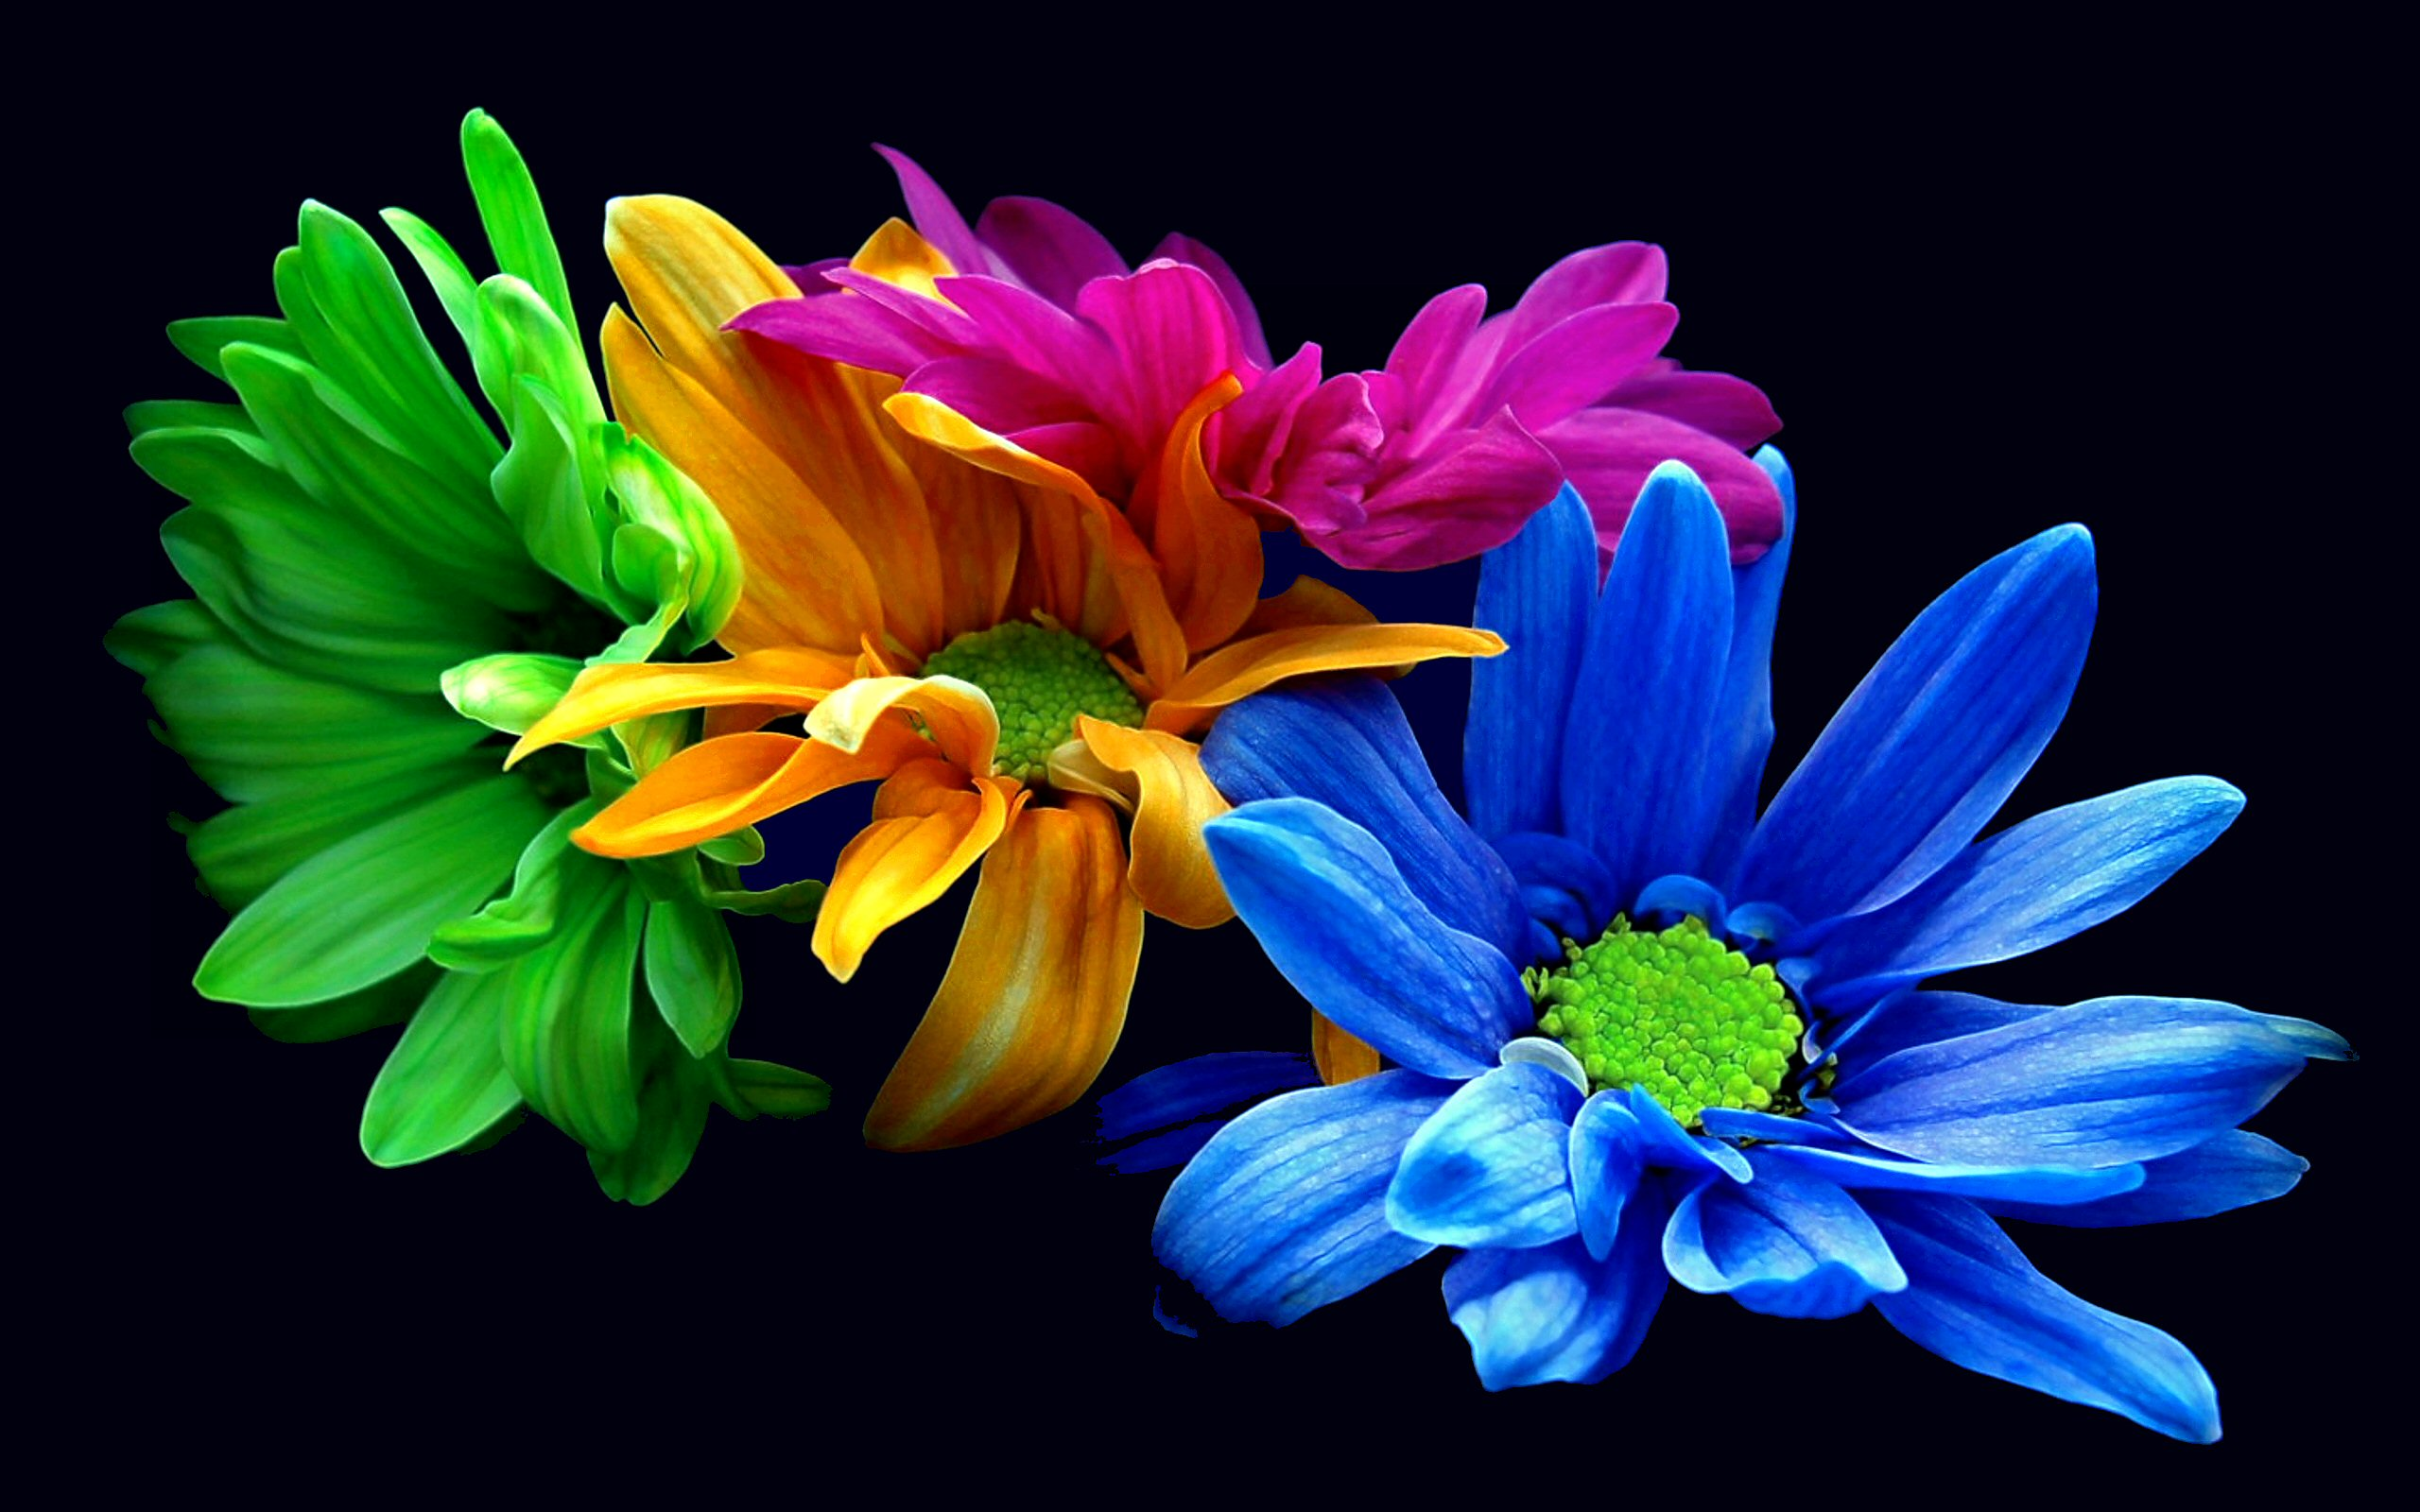 Flower hd wallpaper colors 3d flowers background hd backgrounds flower hd wallpaper colors mightylinksfo